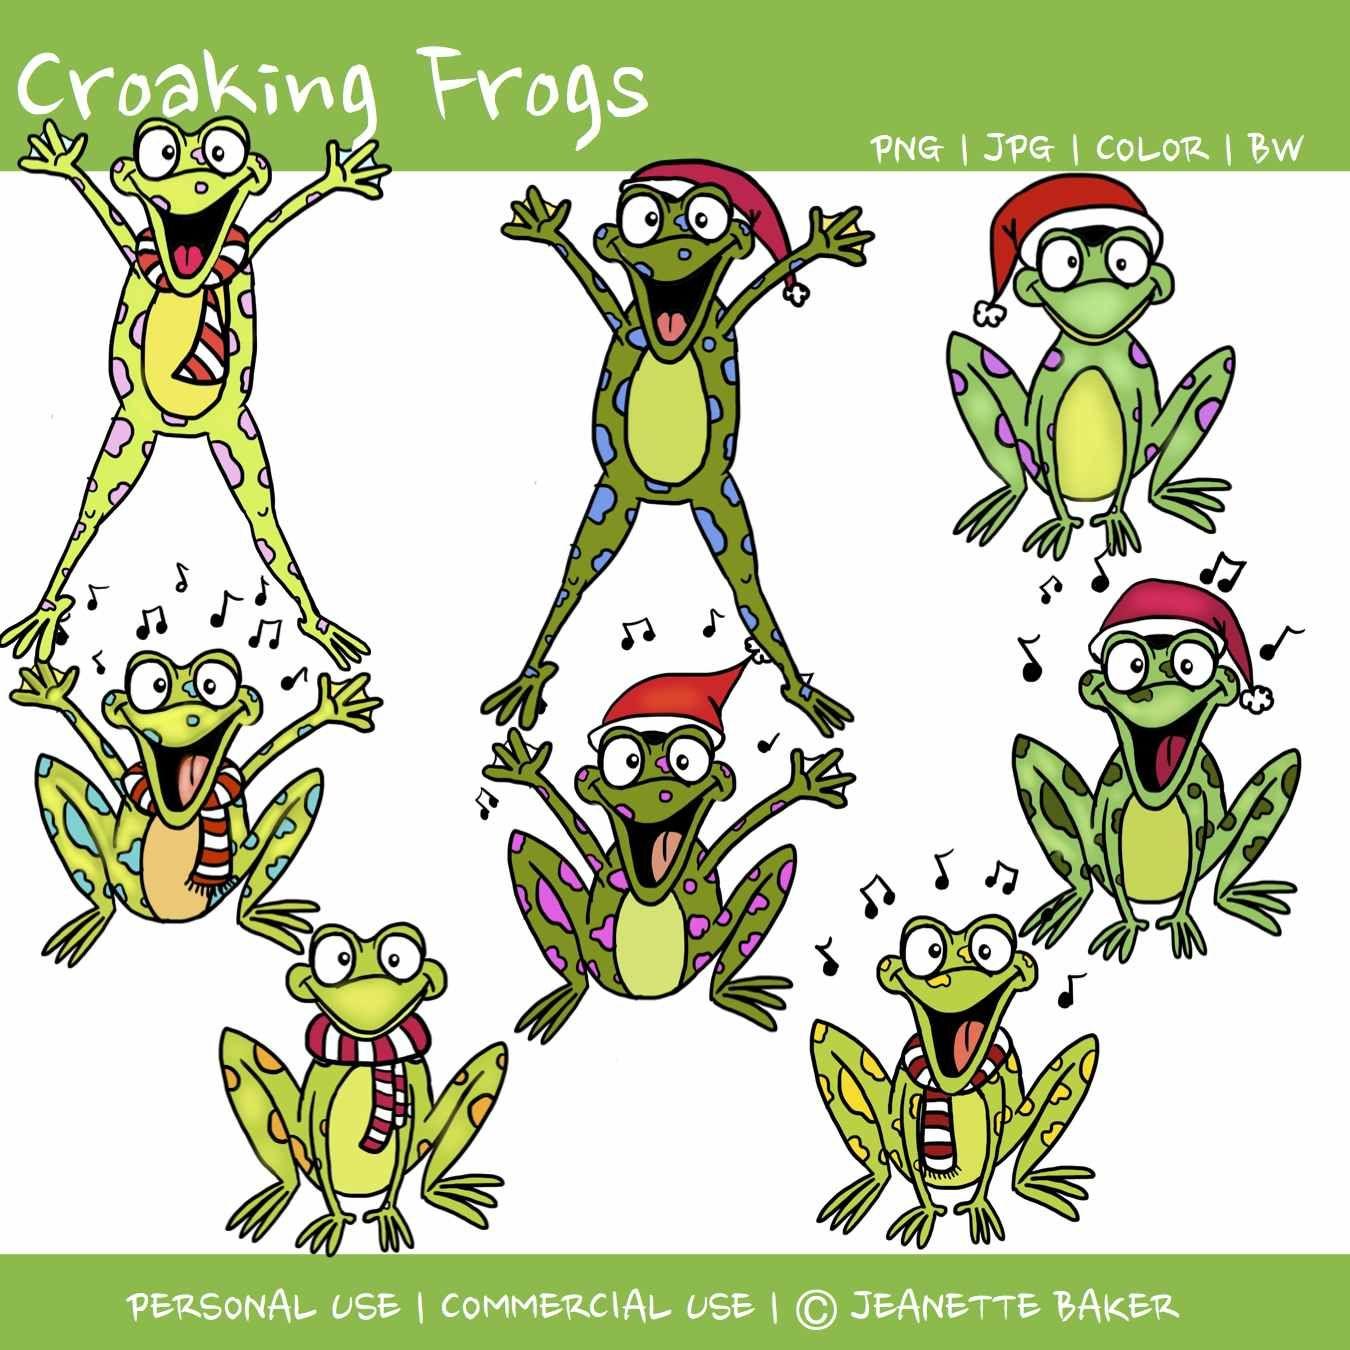 hight resolution of  2 croaking frogs by jeanette baker